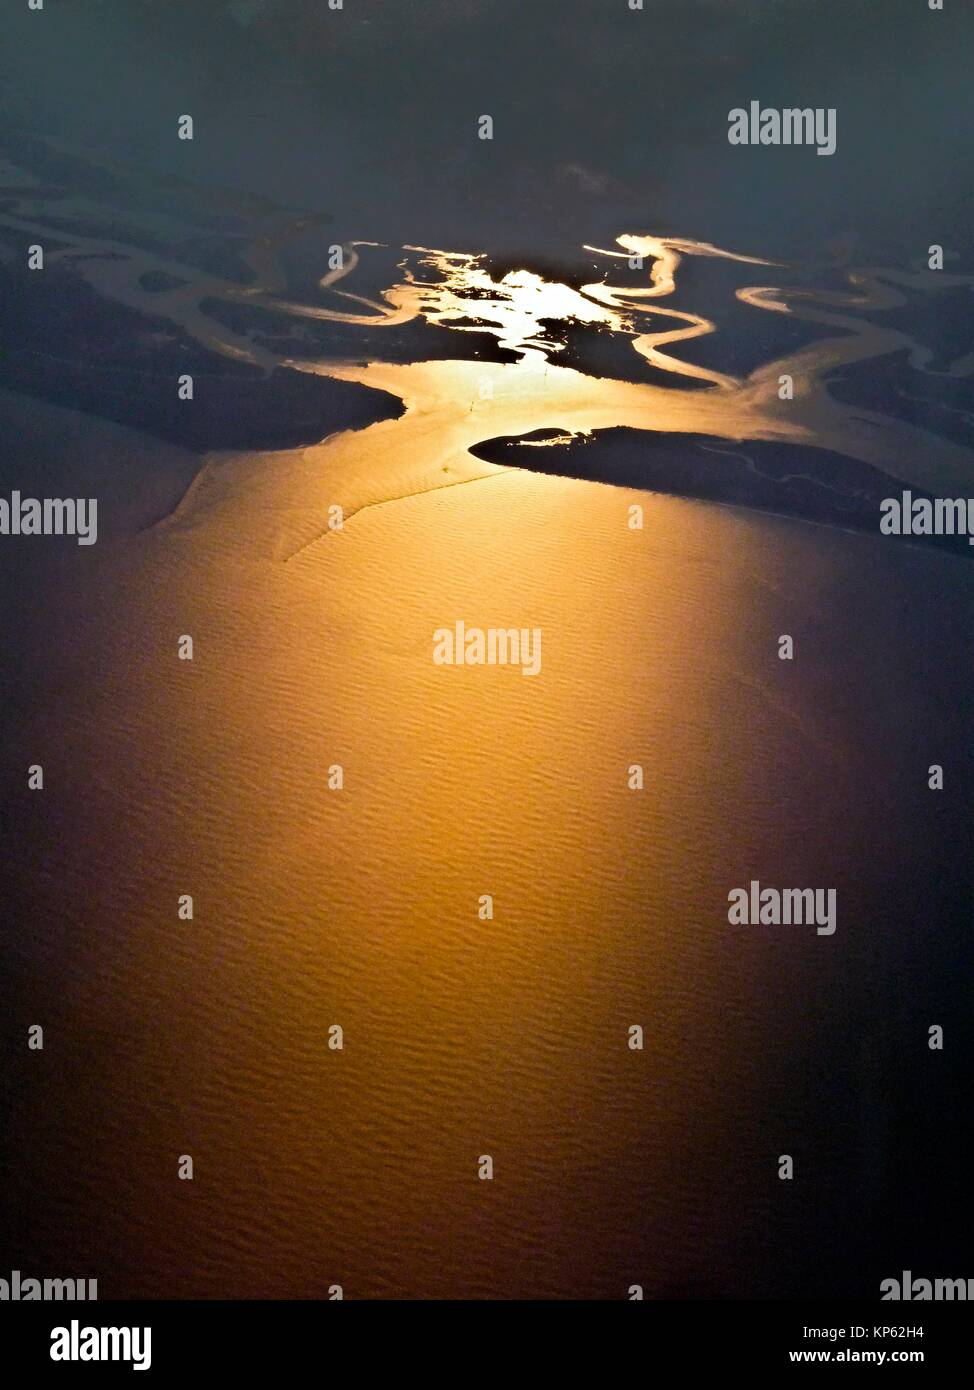 Atlantic coast of the Southern United States at sunset. - Stock Image